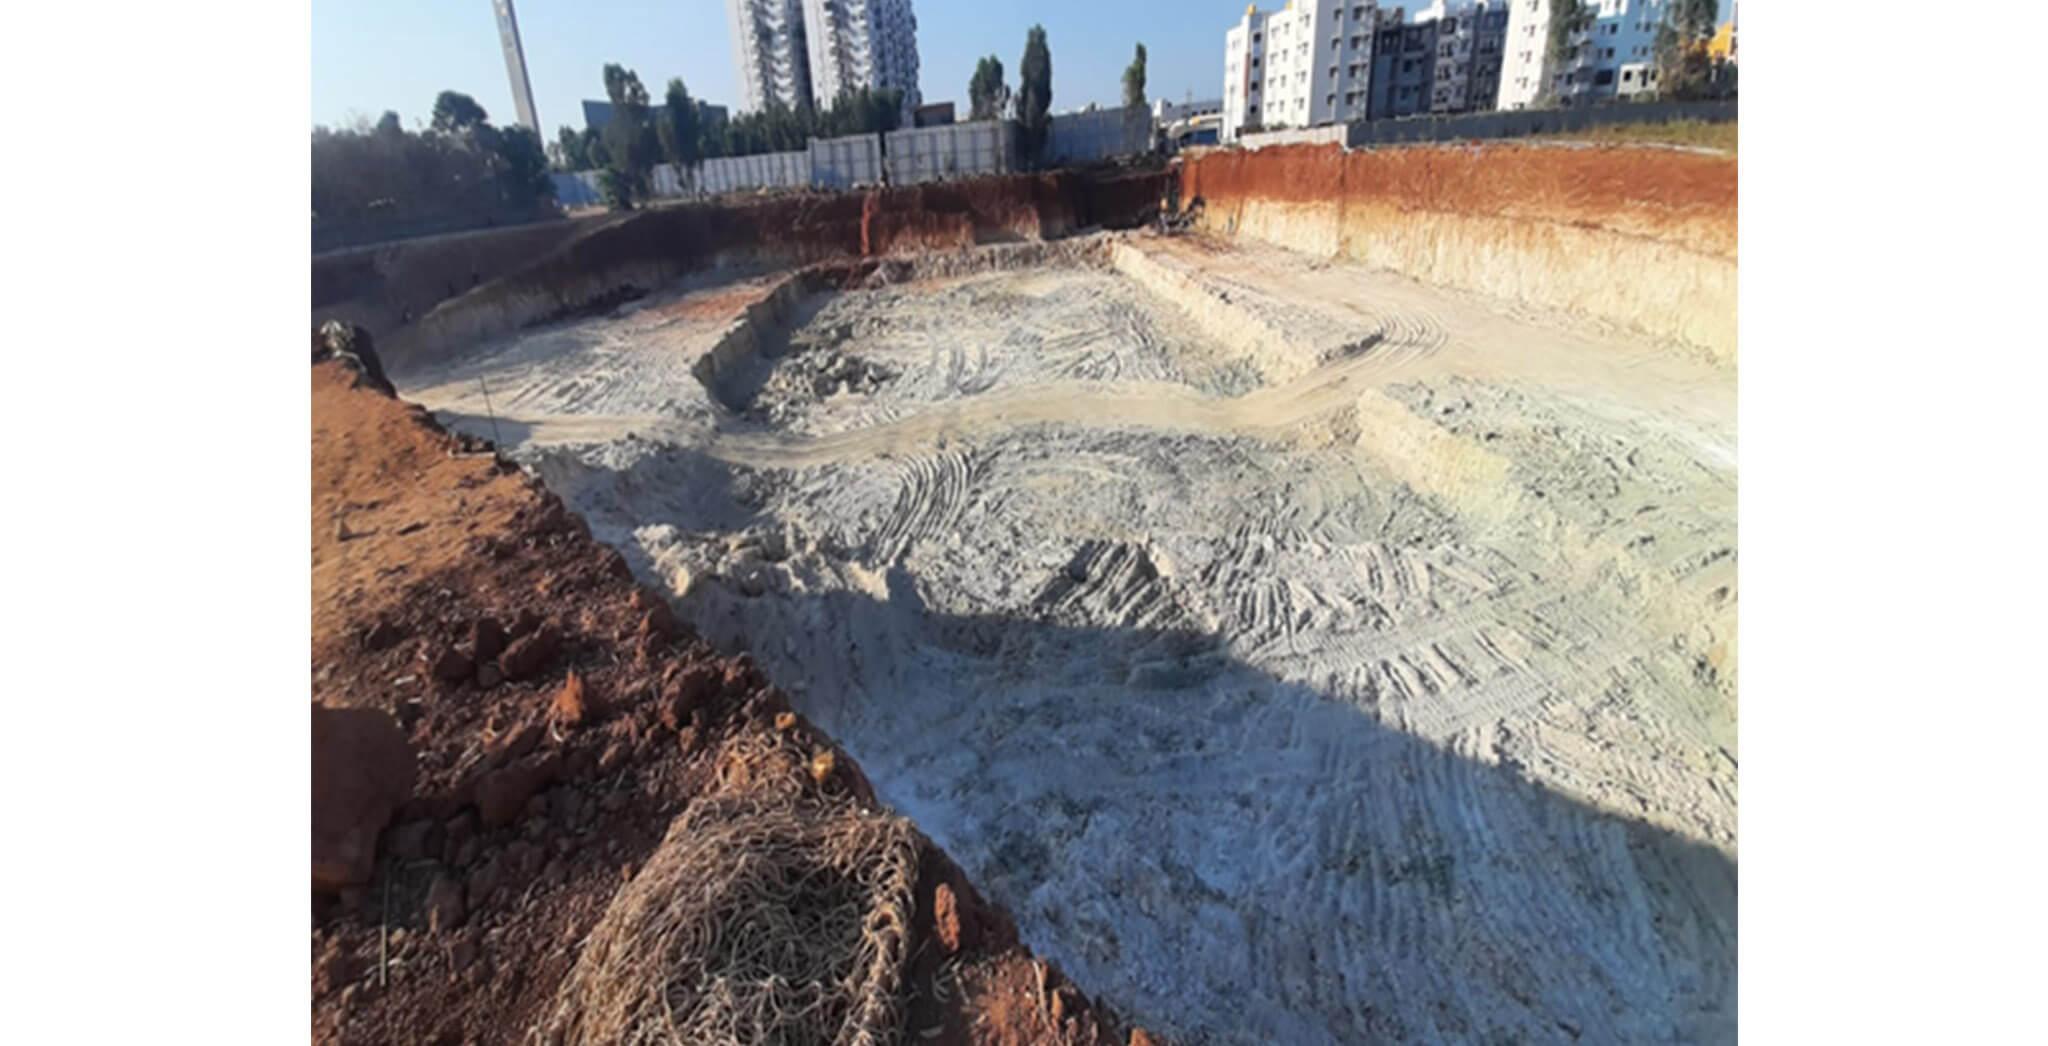 Mar 2020 - Arcadia: Excavation completed